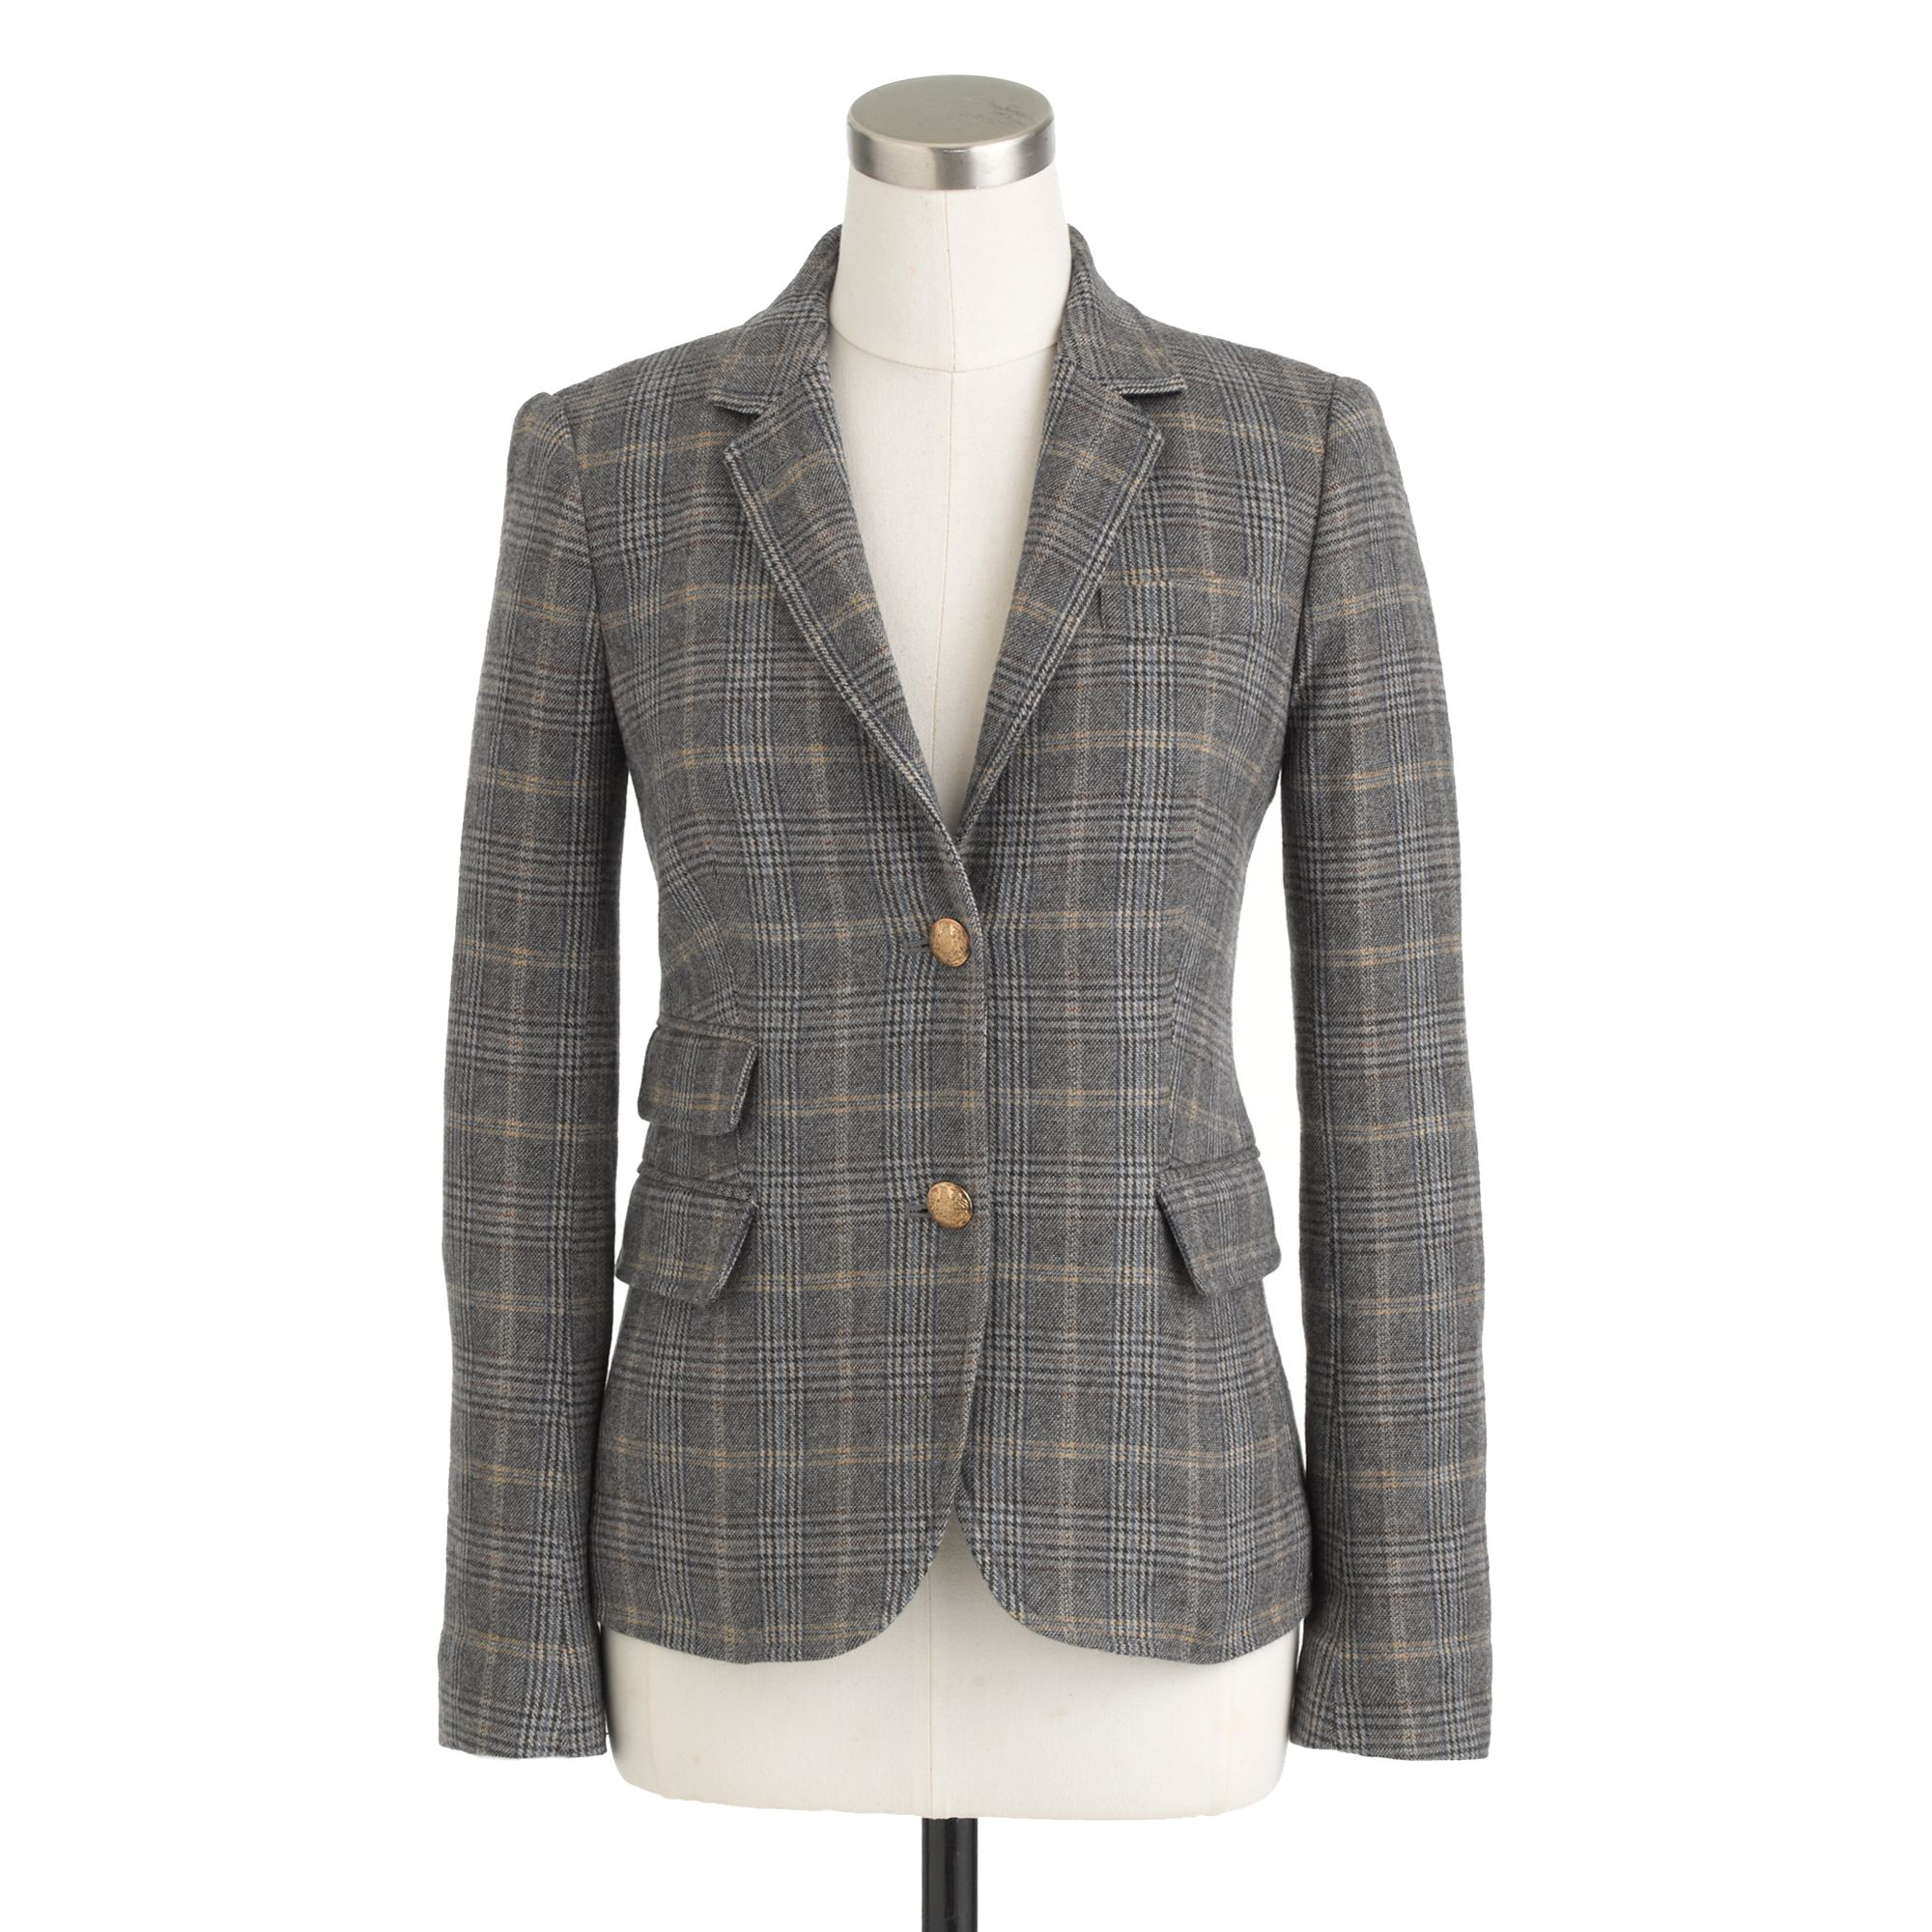 J.Crew Petite Schoolboy Blazer In English Tweed In Gray